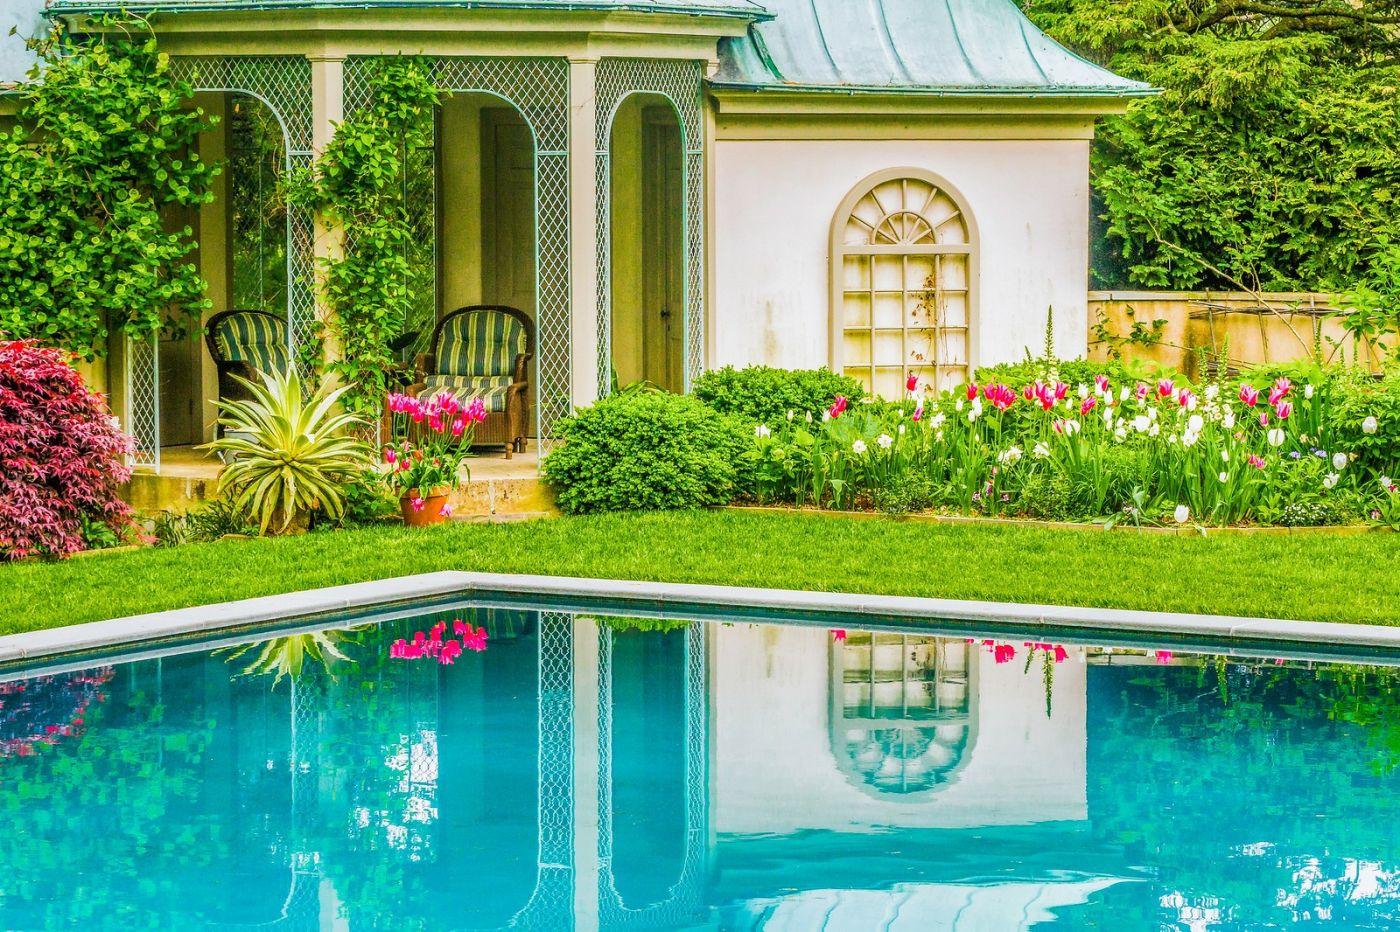 Chanticleer花园,一景一画_图1-15